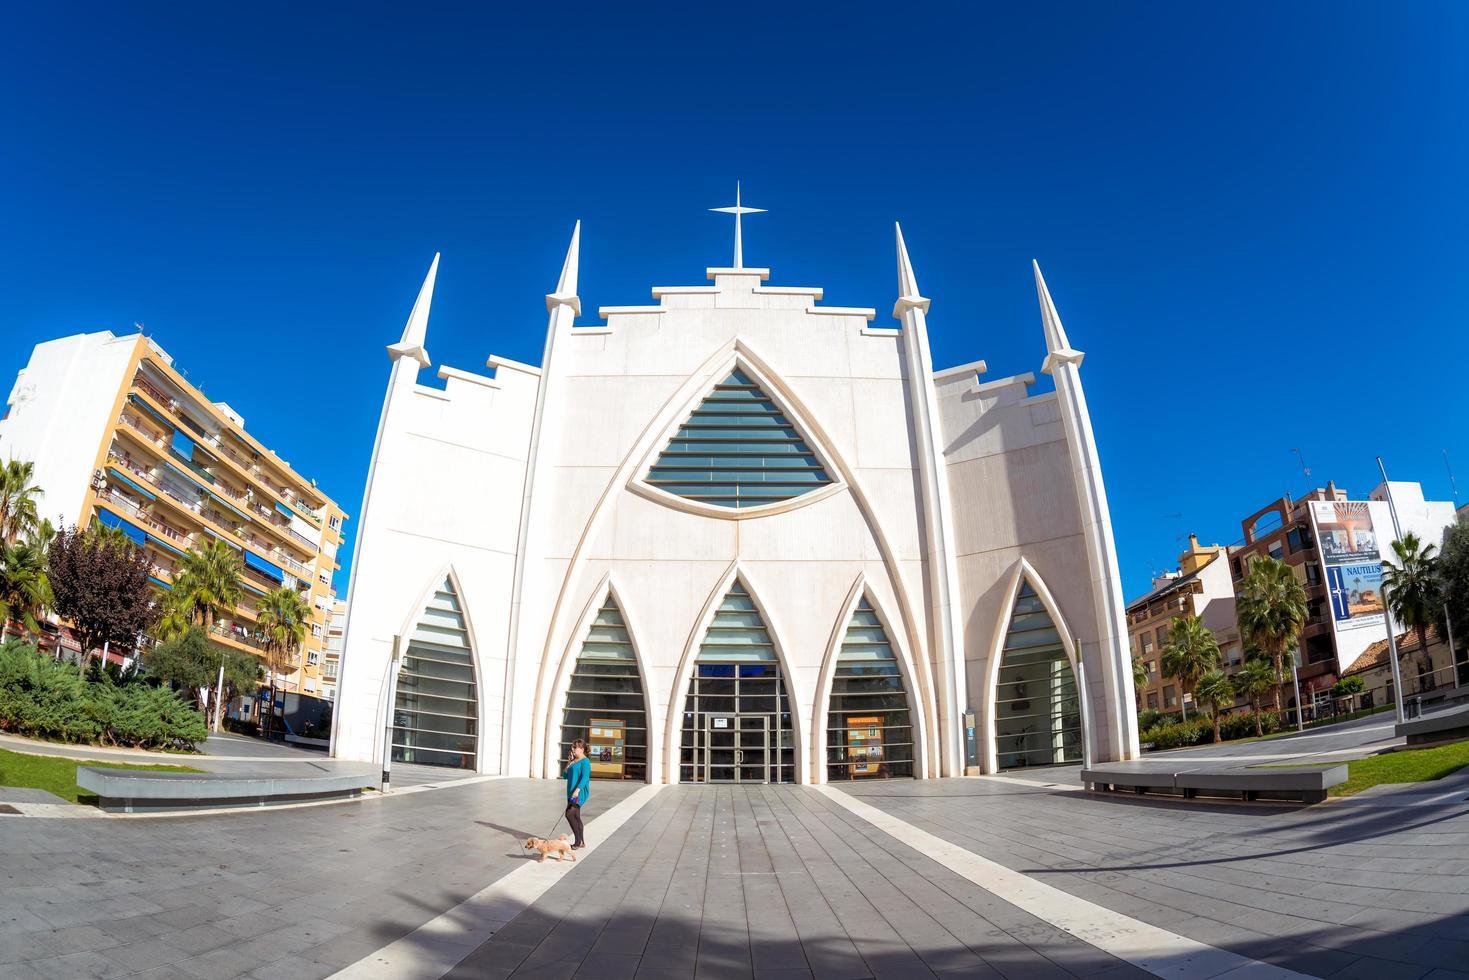 torrevieja, espagne 2017 - iglesia del sagrado corazon de jesus, plaza de oriente photo